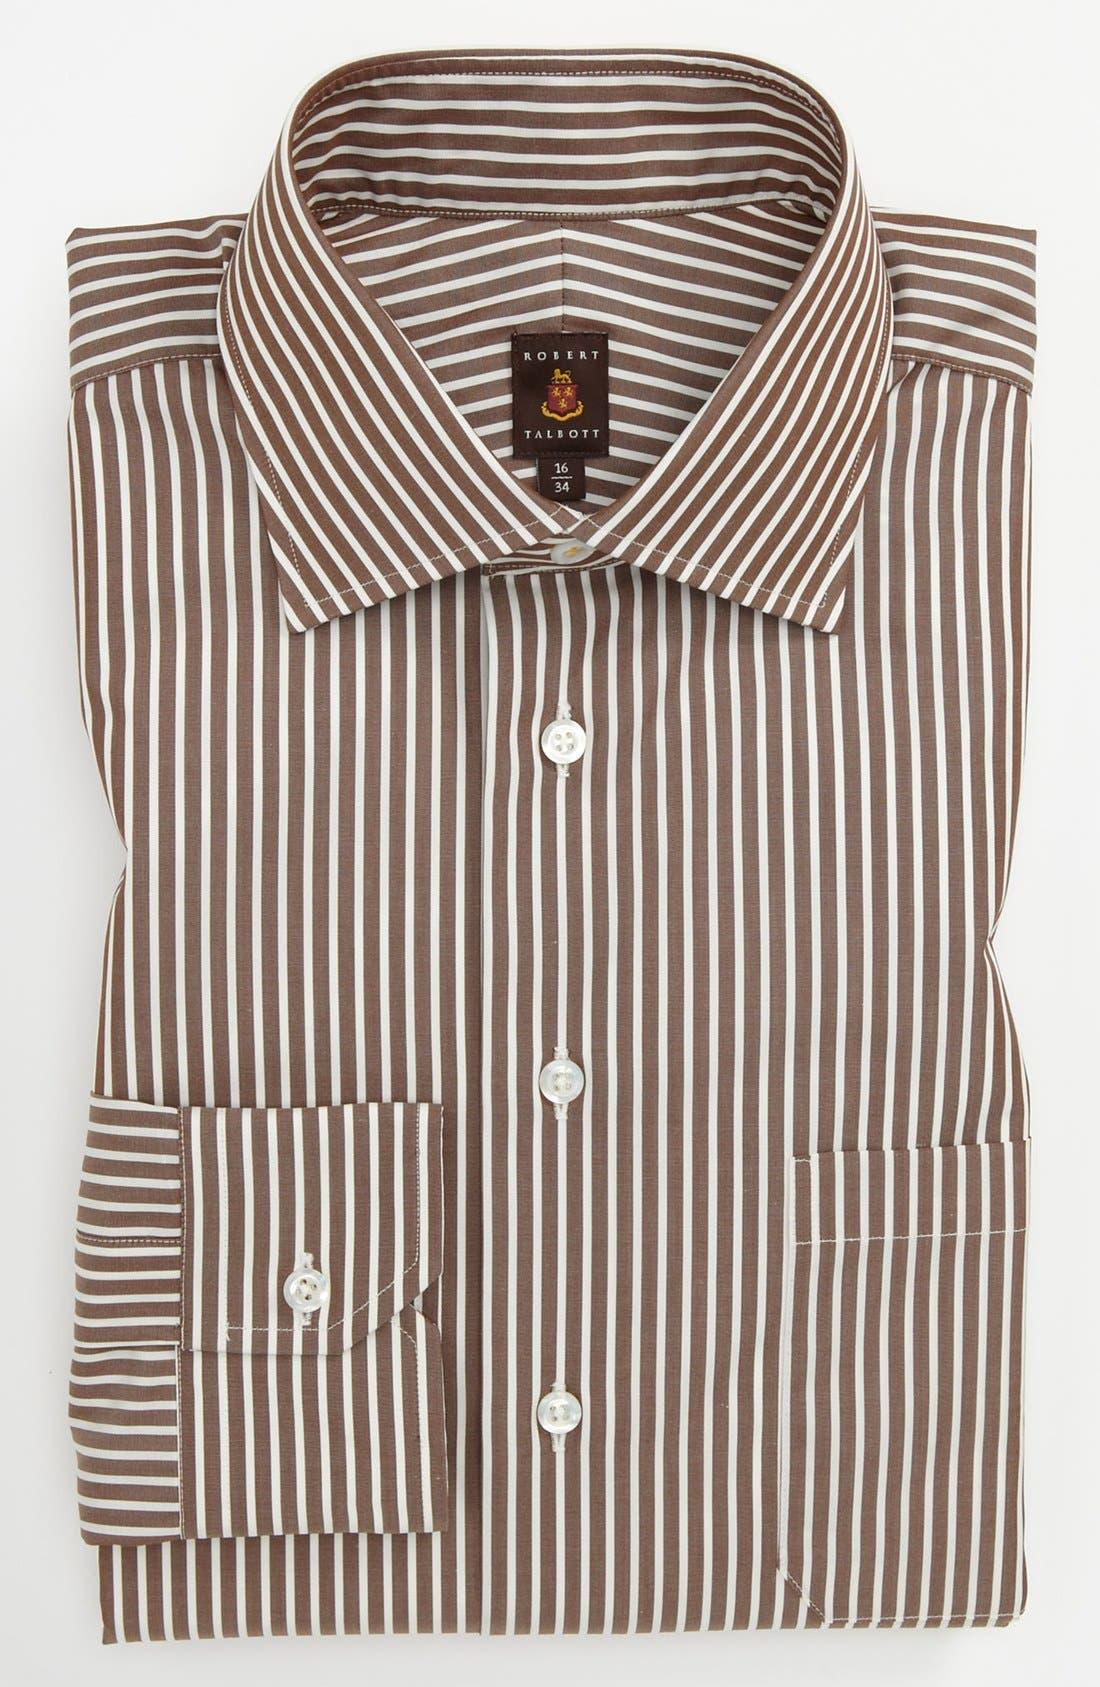 Alternate Image 1 Selected - Robert Talbott Regular Fit Dress Shirt